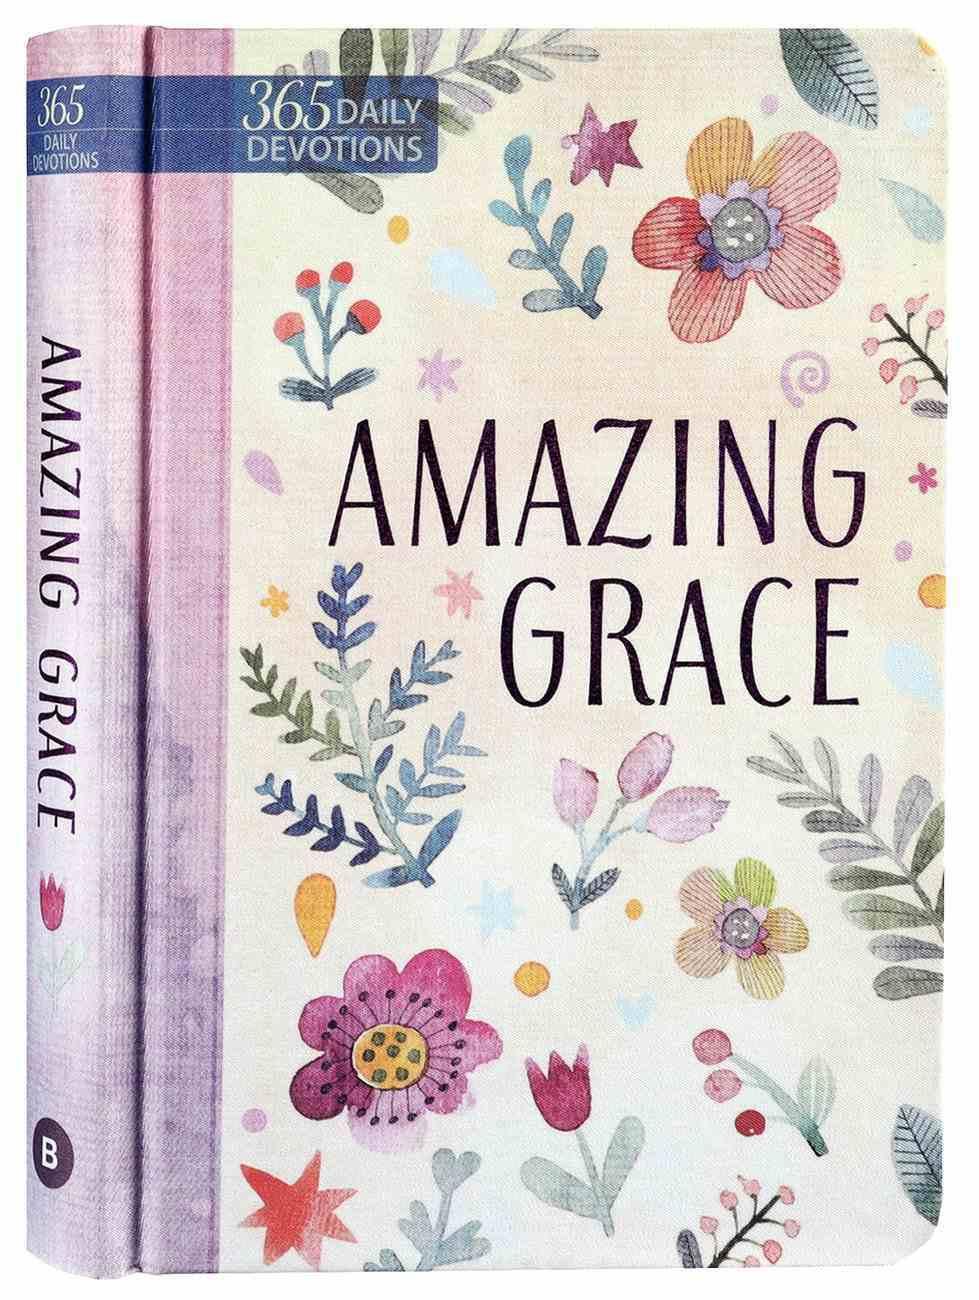 Amazing Grace: 365 Daily Devotions Imitation Leather